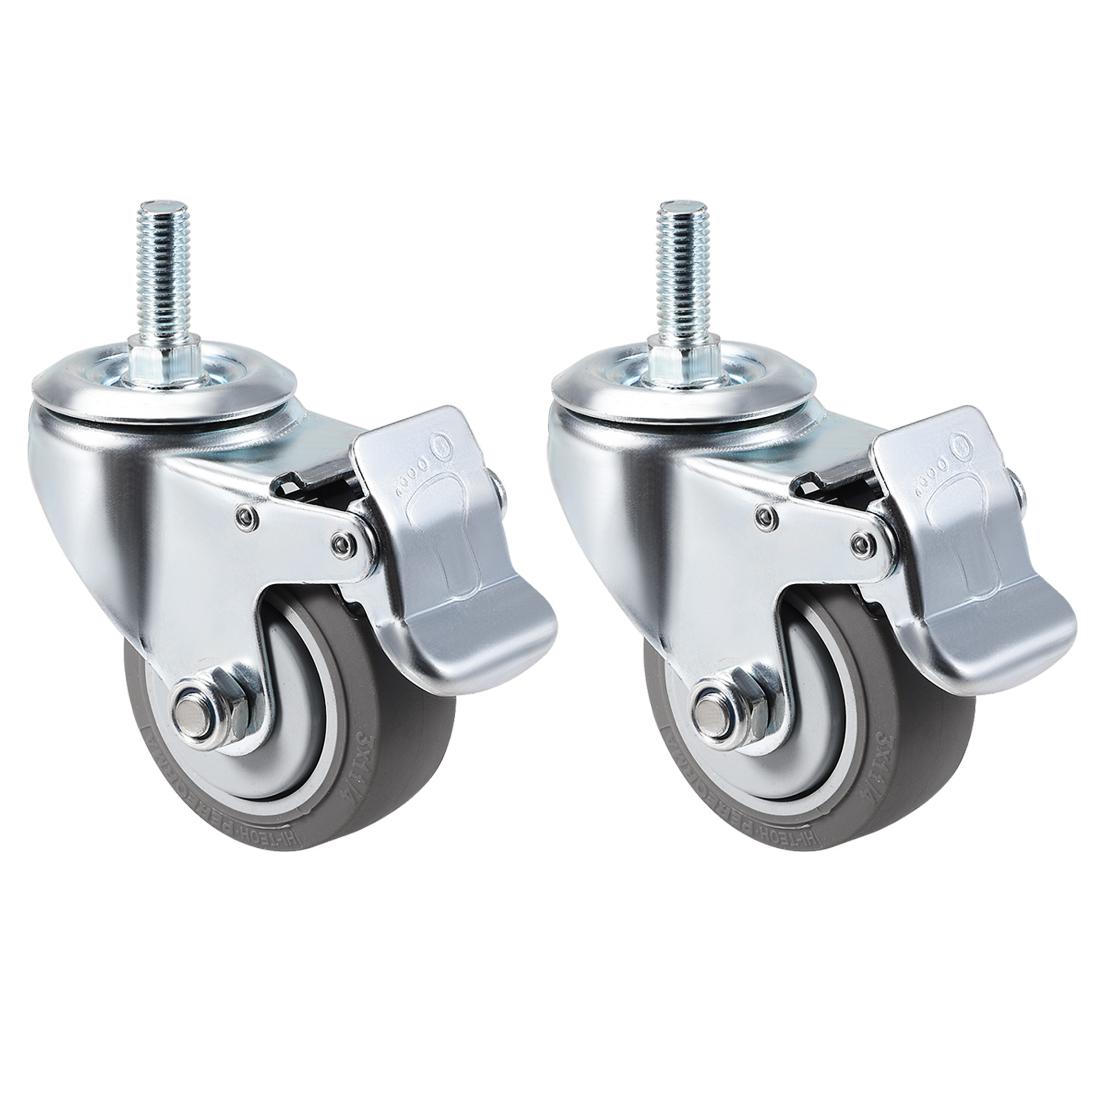 Swivel Caster Wheels TPR Caster 3 Inch Wheel M12 x 30mm Thread with Brake , 2pcs